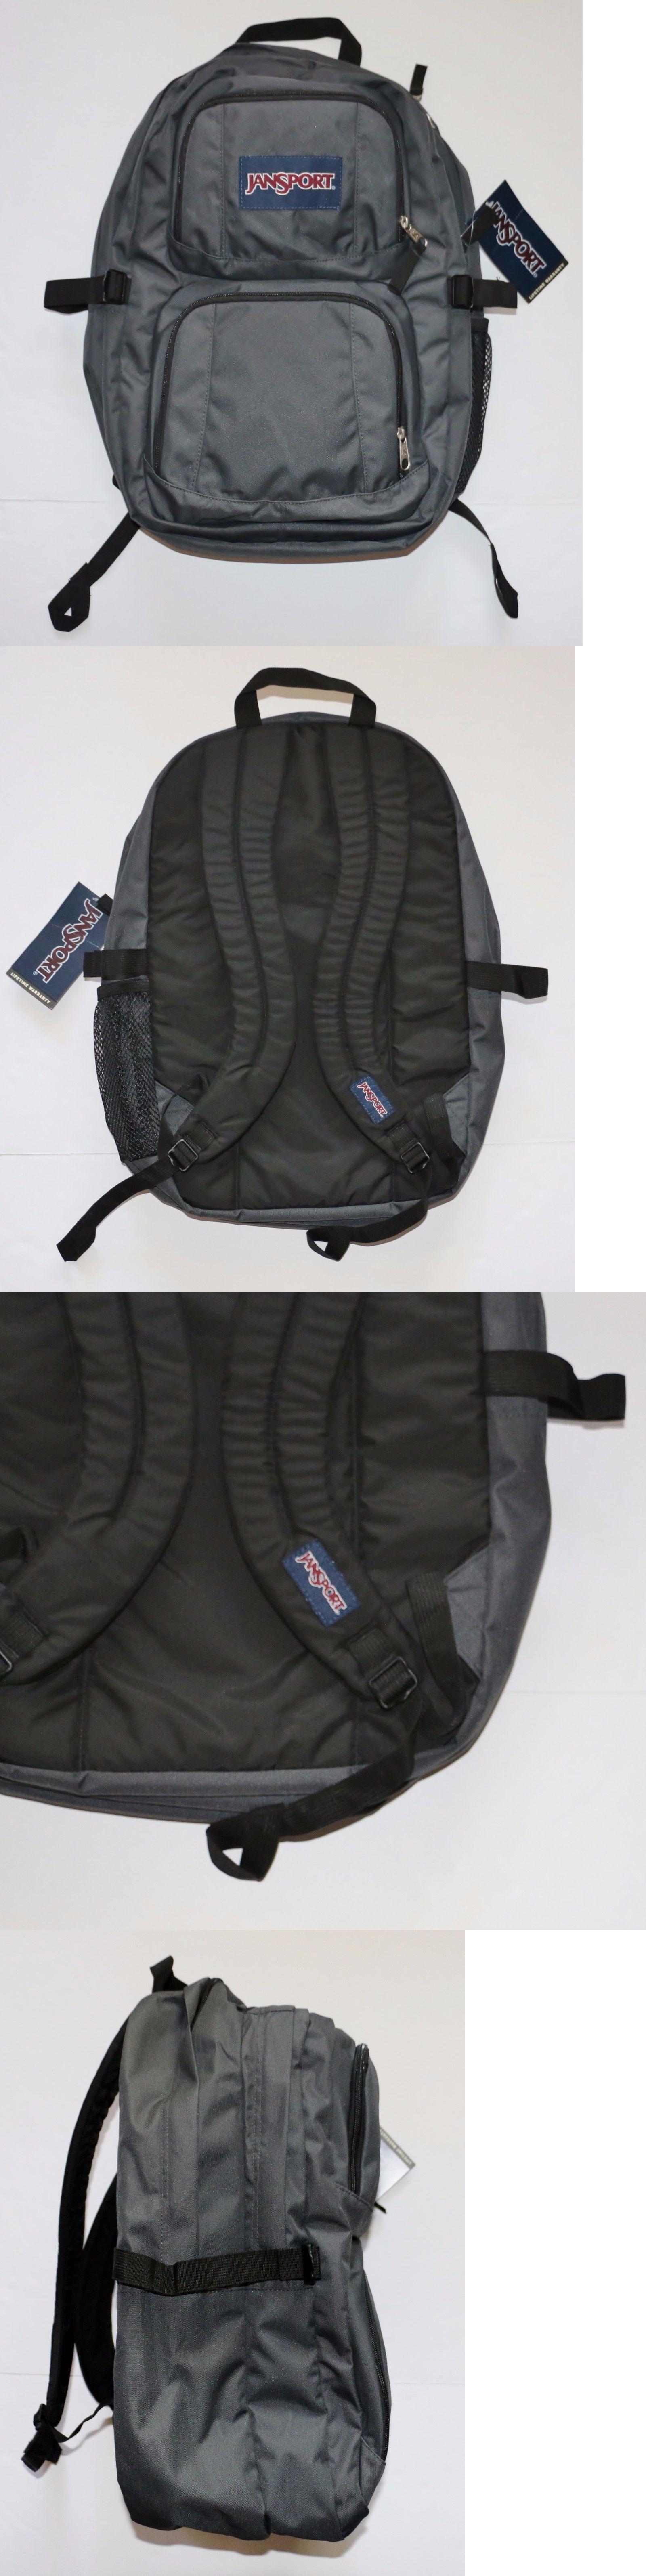 bags and backpacks new jansport merit backpack 17 laptop